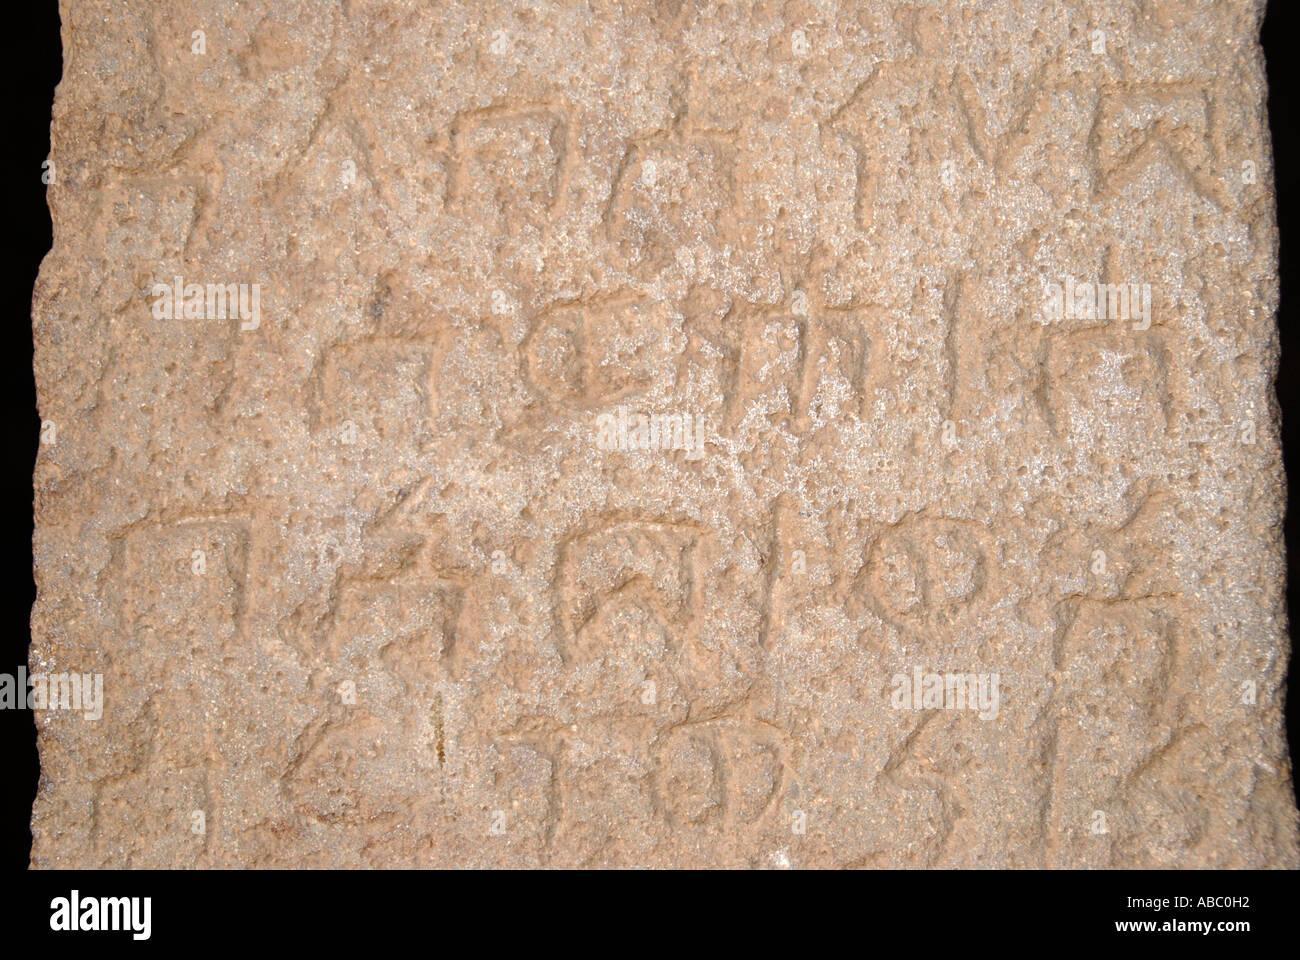 Ezana-stele with ancient script in Ge'ez Axum Ethiopia - Stock Image